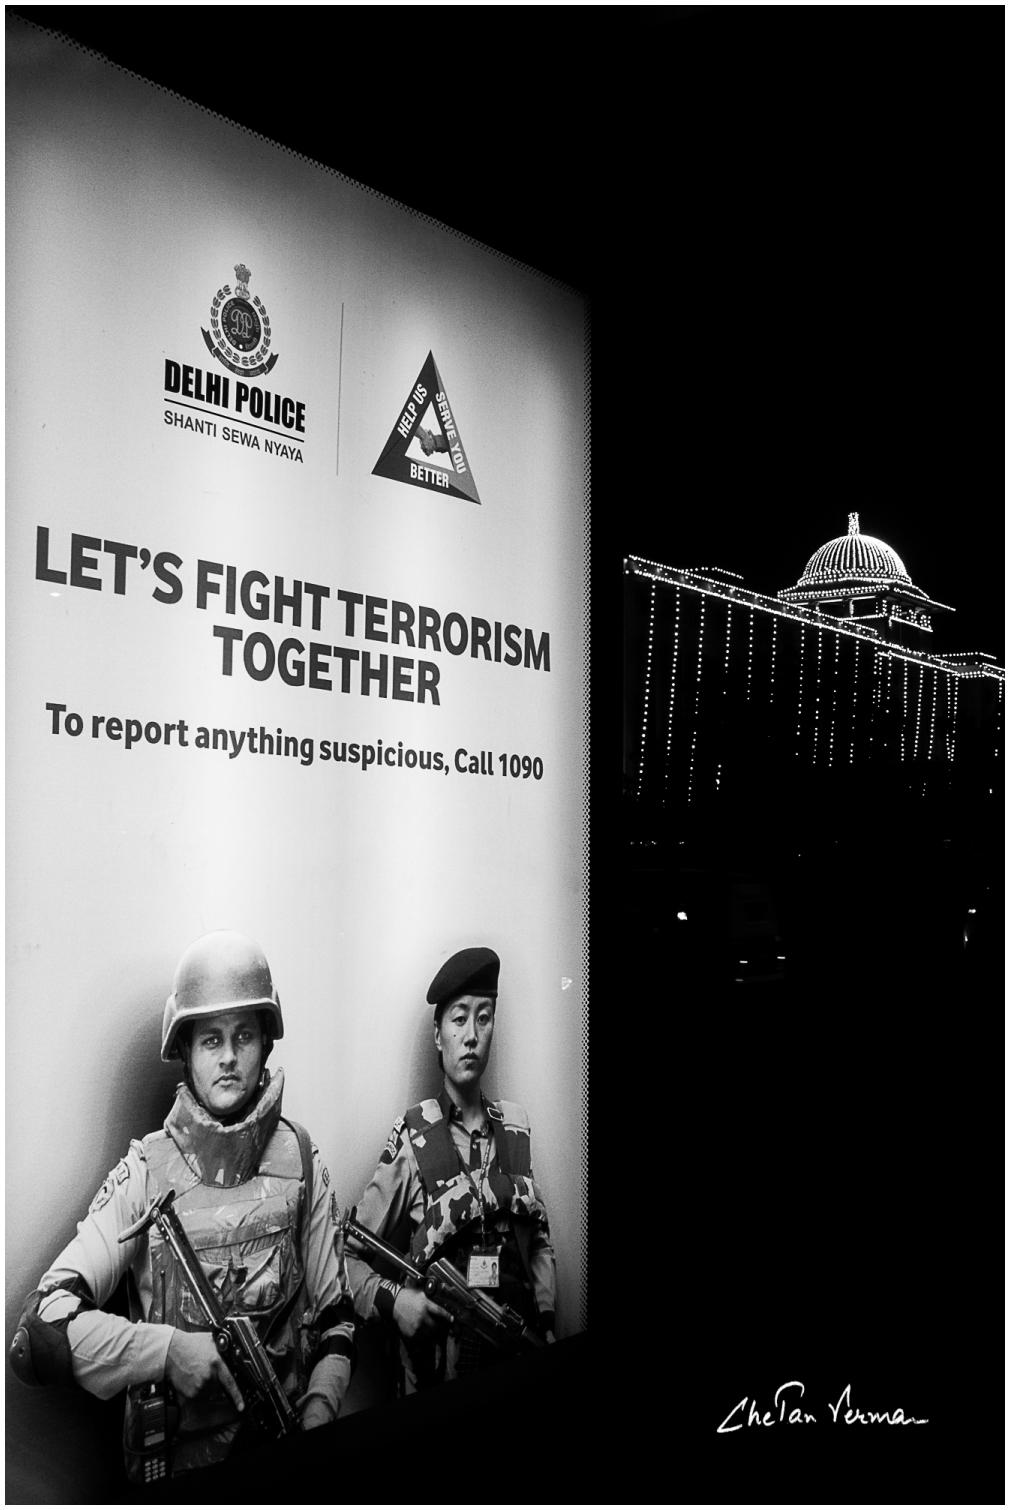 Lets fight terrorism